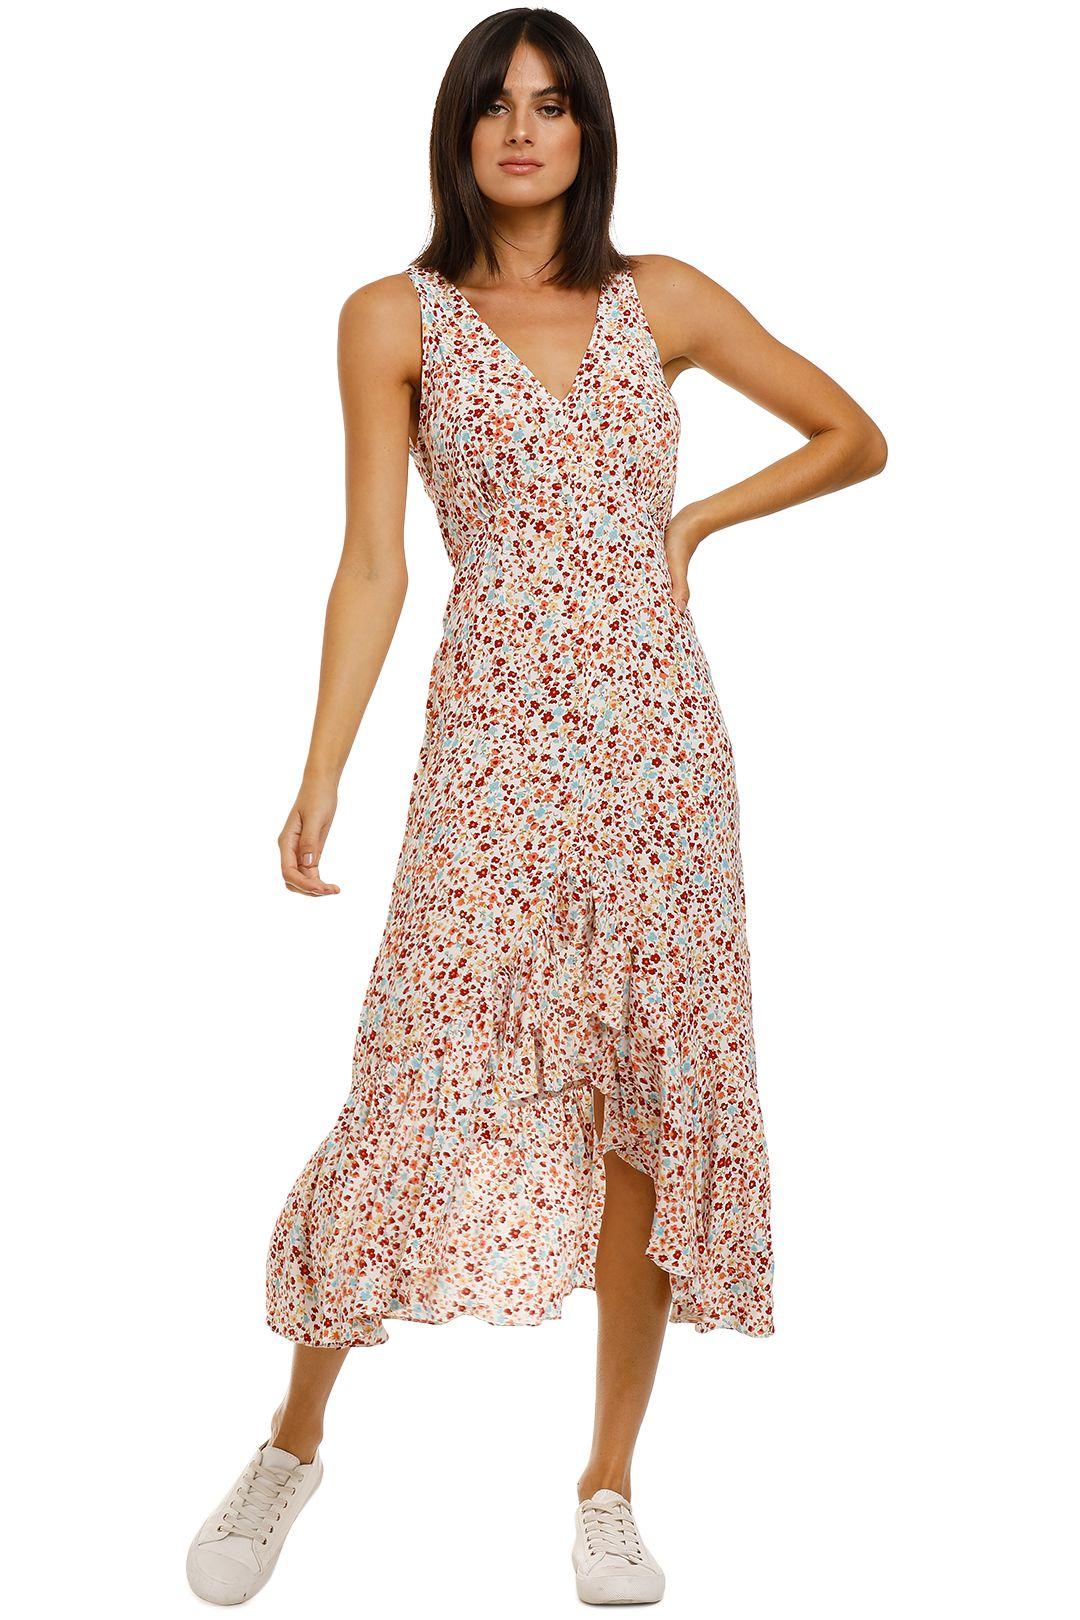 Rue-Stiic-Talina-Ruffle-Dress-Fujette-Marocaine-Front